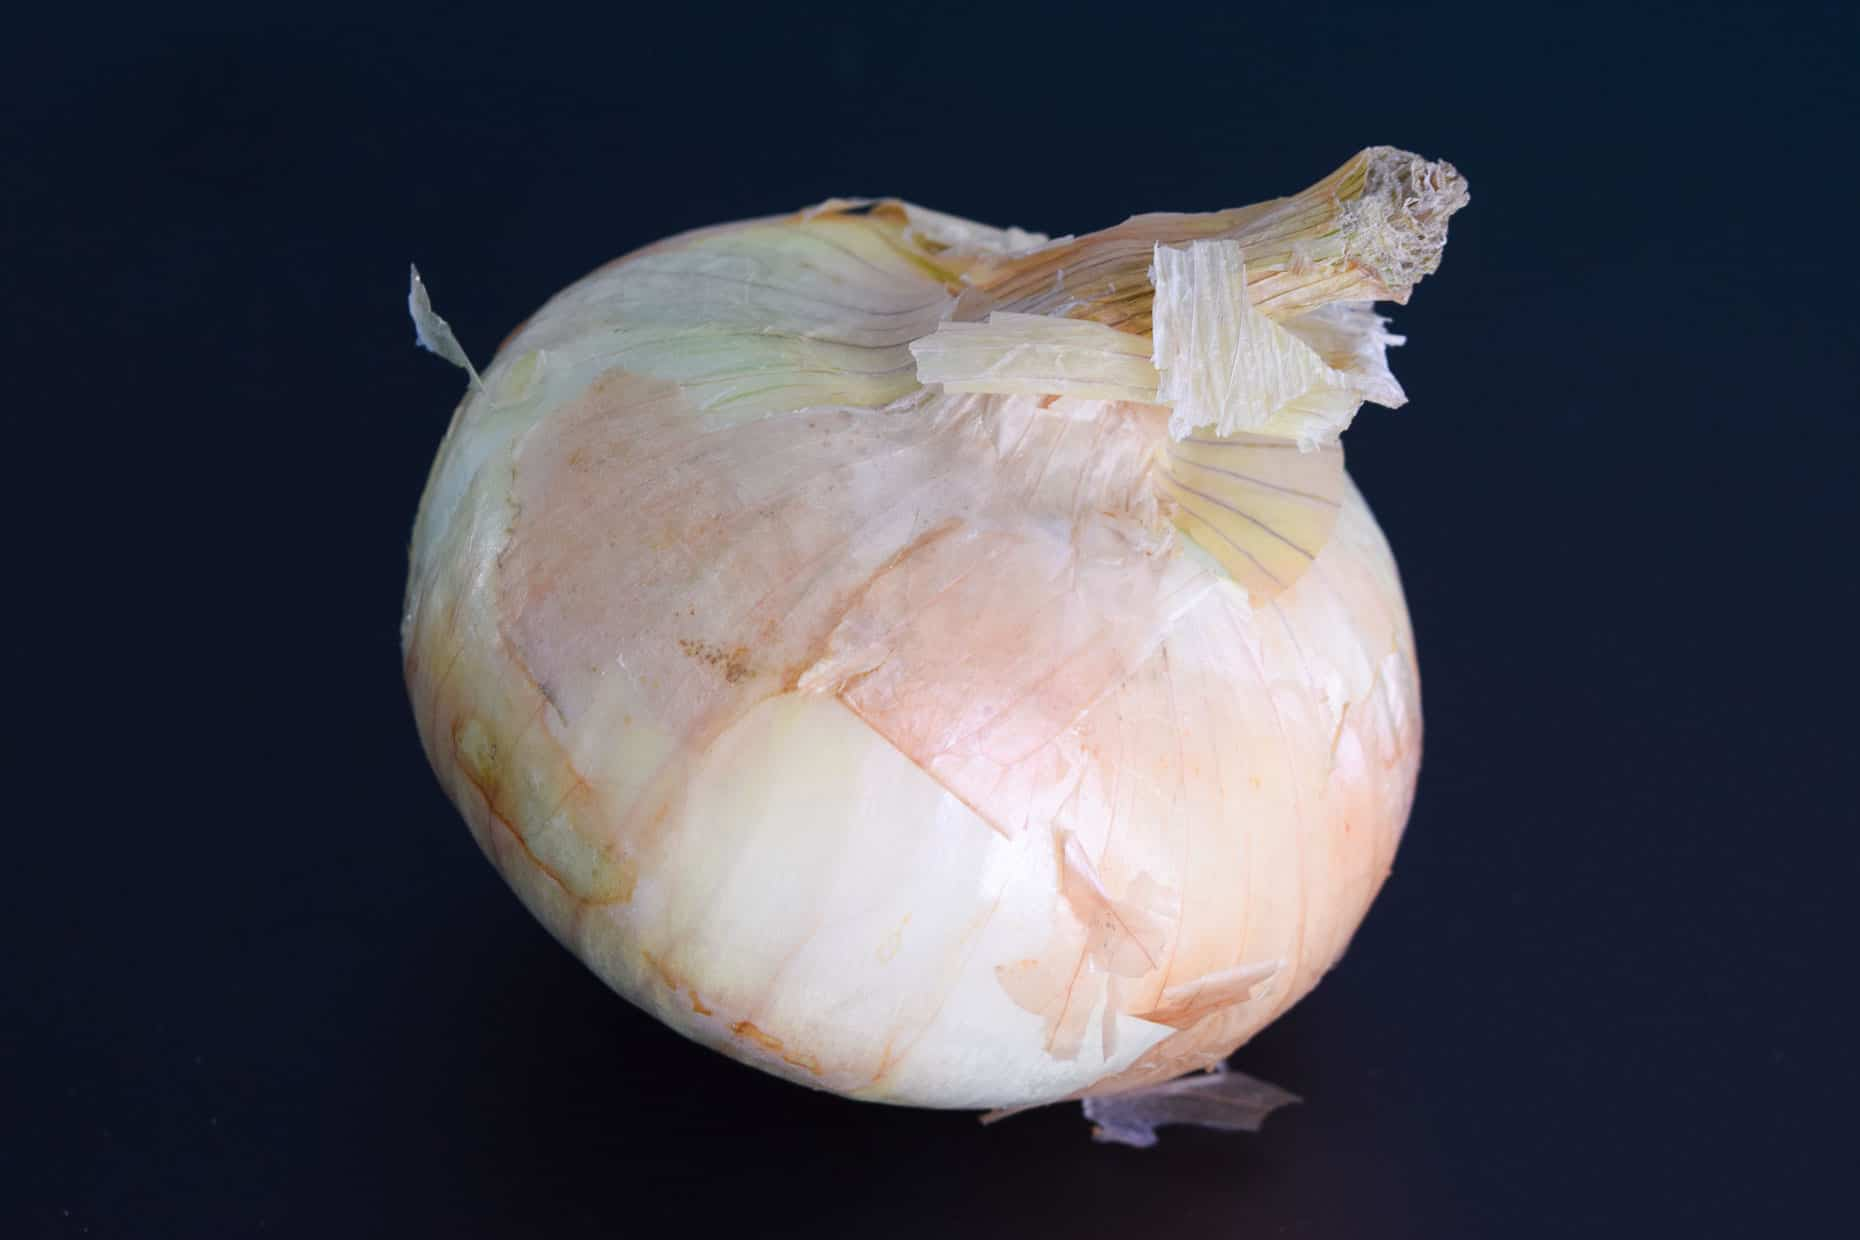 Vidalio onion on black background